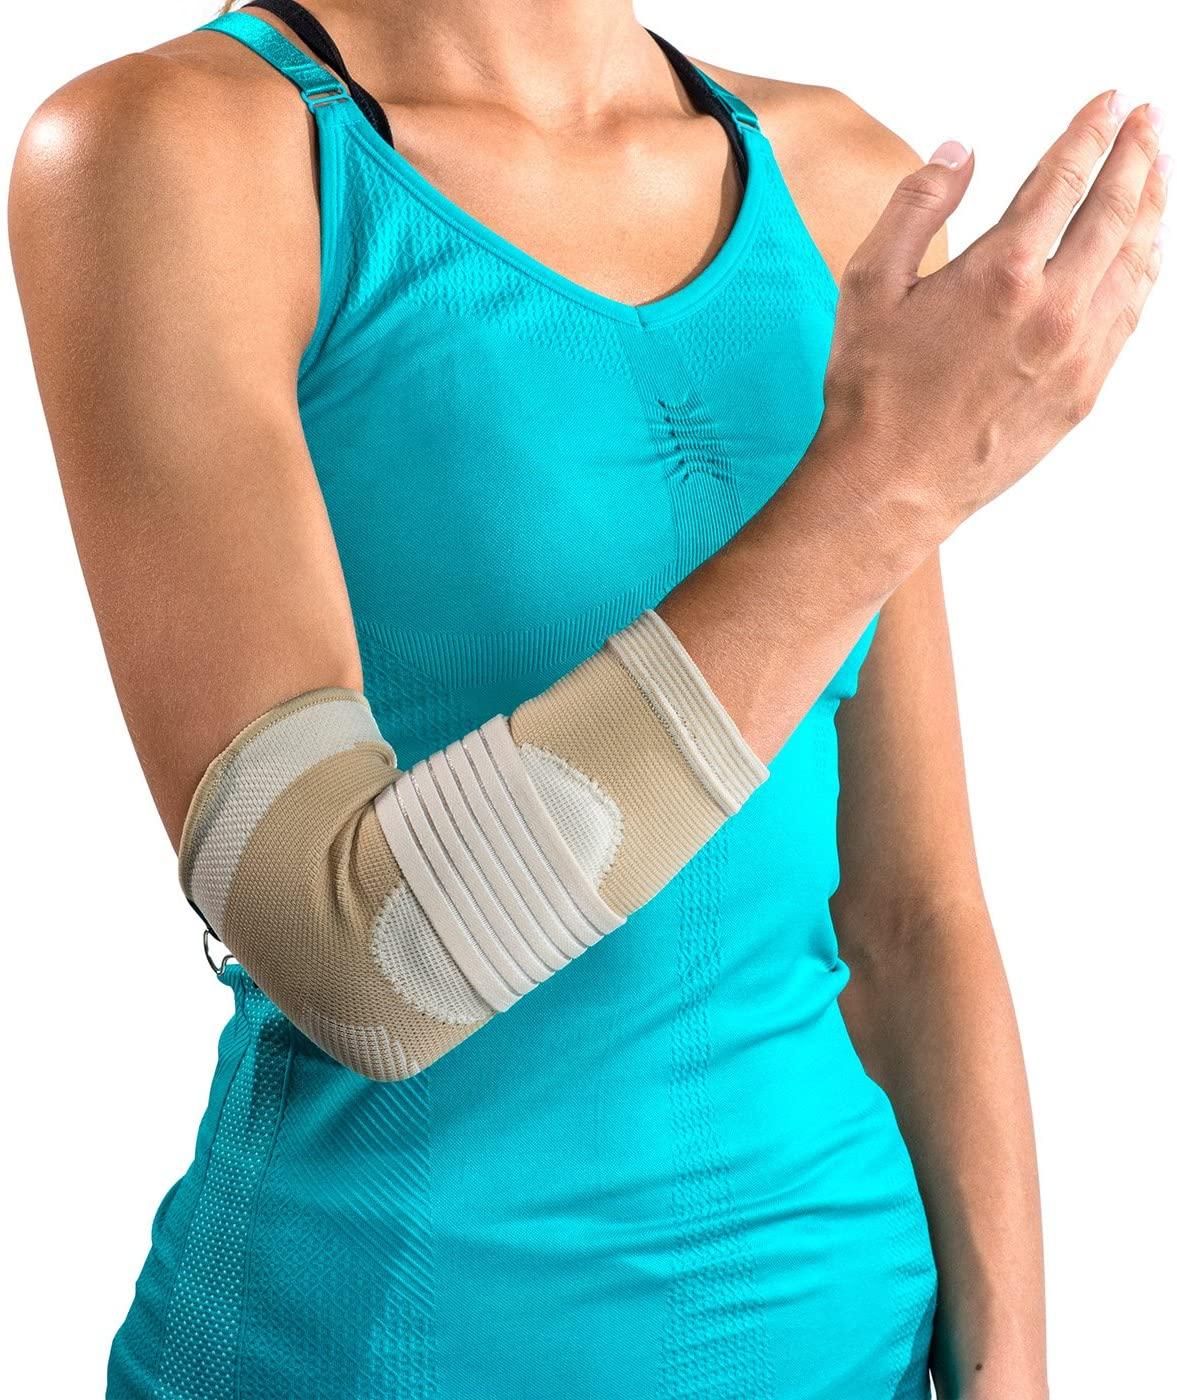 DonJoy Advantage DA161ES02-TAN-S Deluxe Elastic Elbow for Sprains, Strains, Golfer's and Tennis Elbow, Tan, Small 8